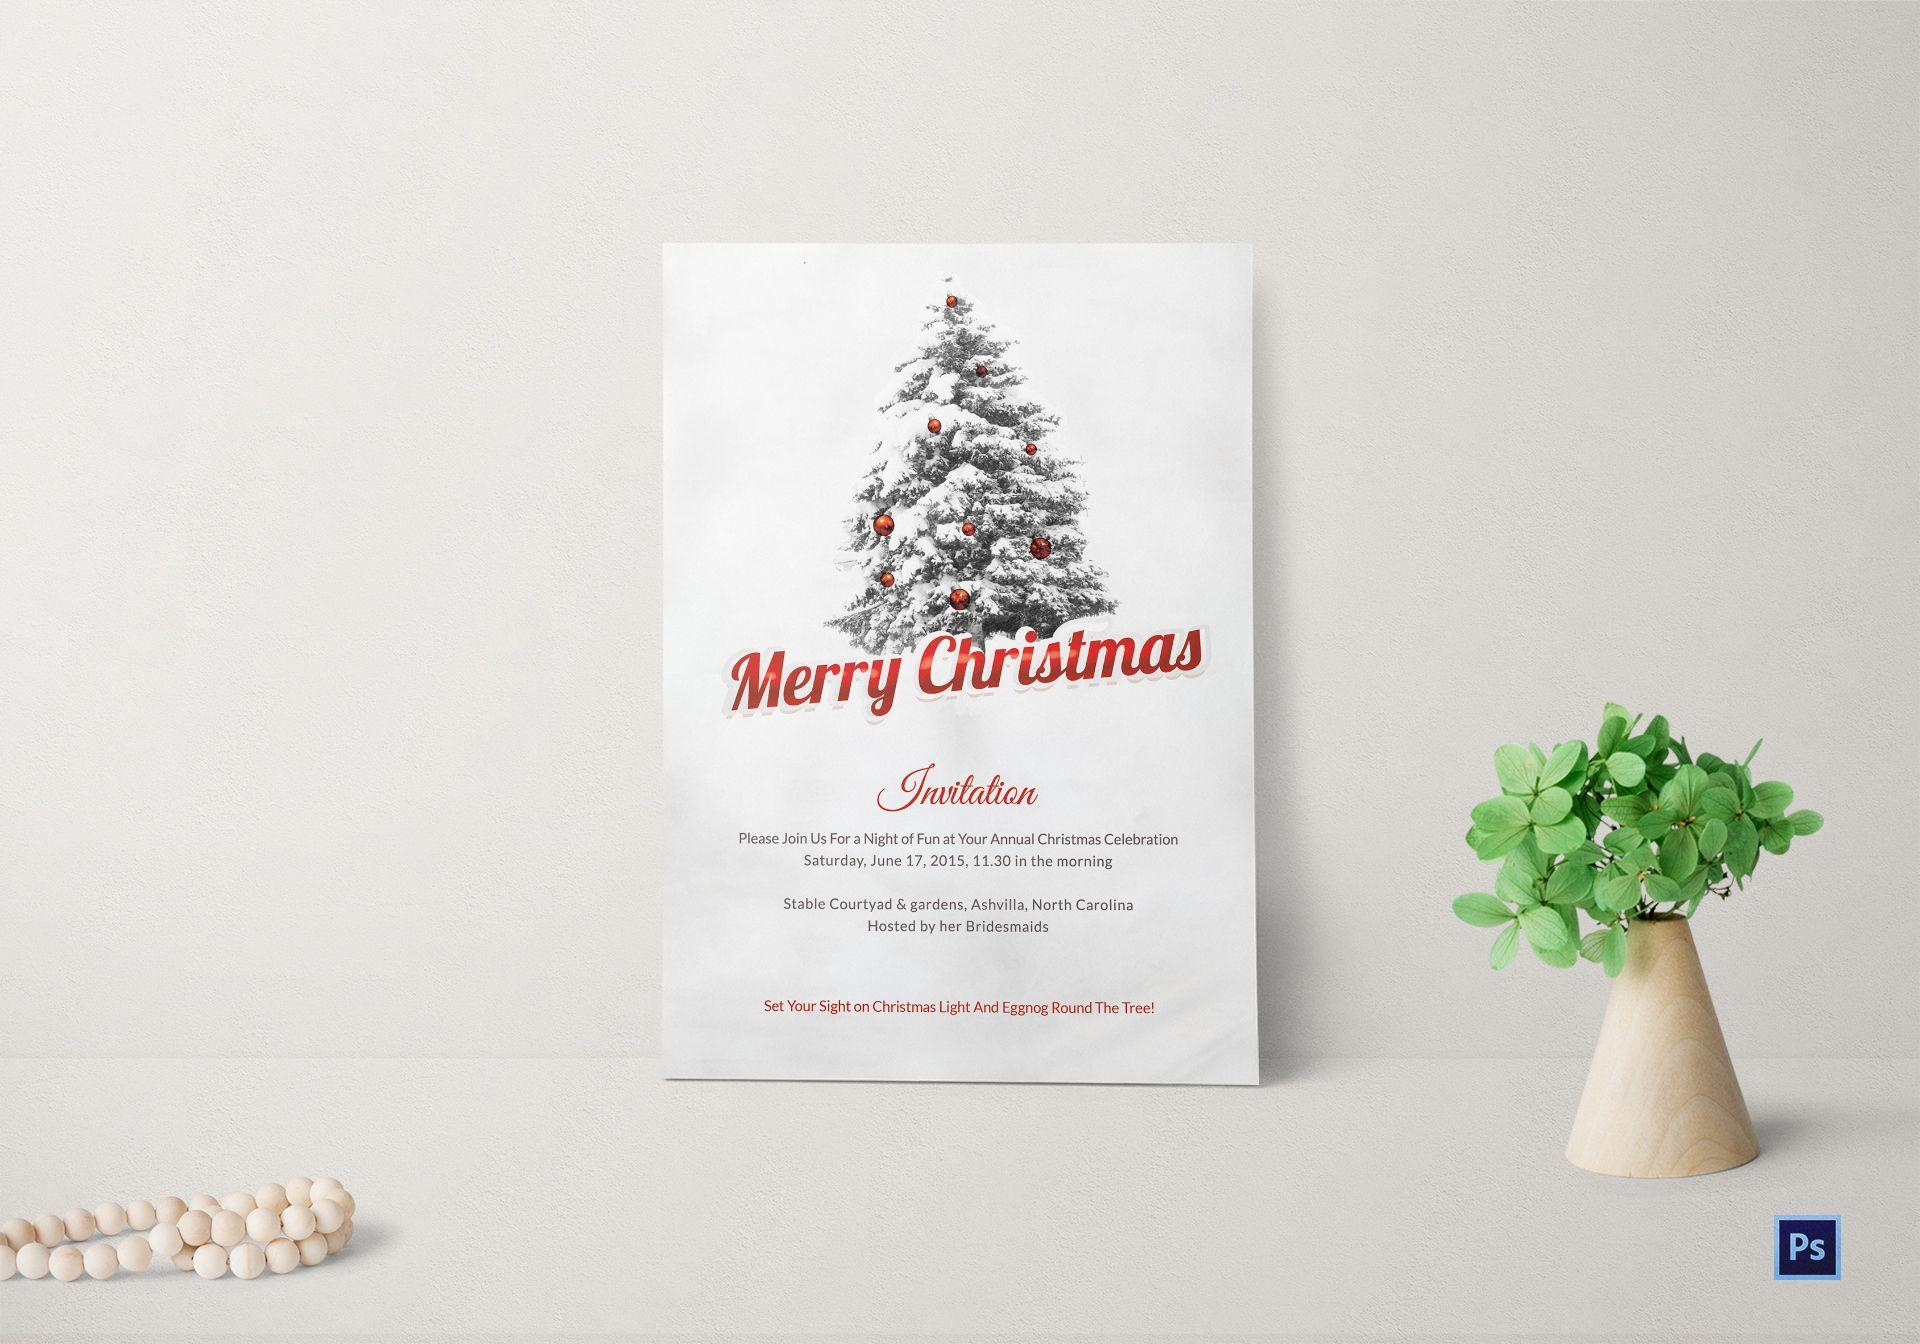 Christmas Invitation.Merry Christmas Invitation Card